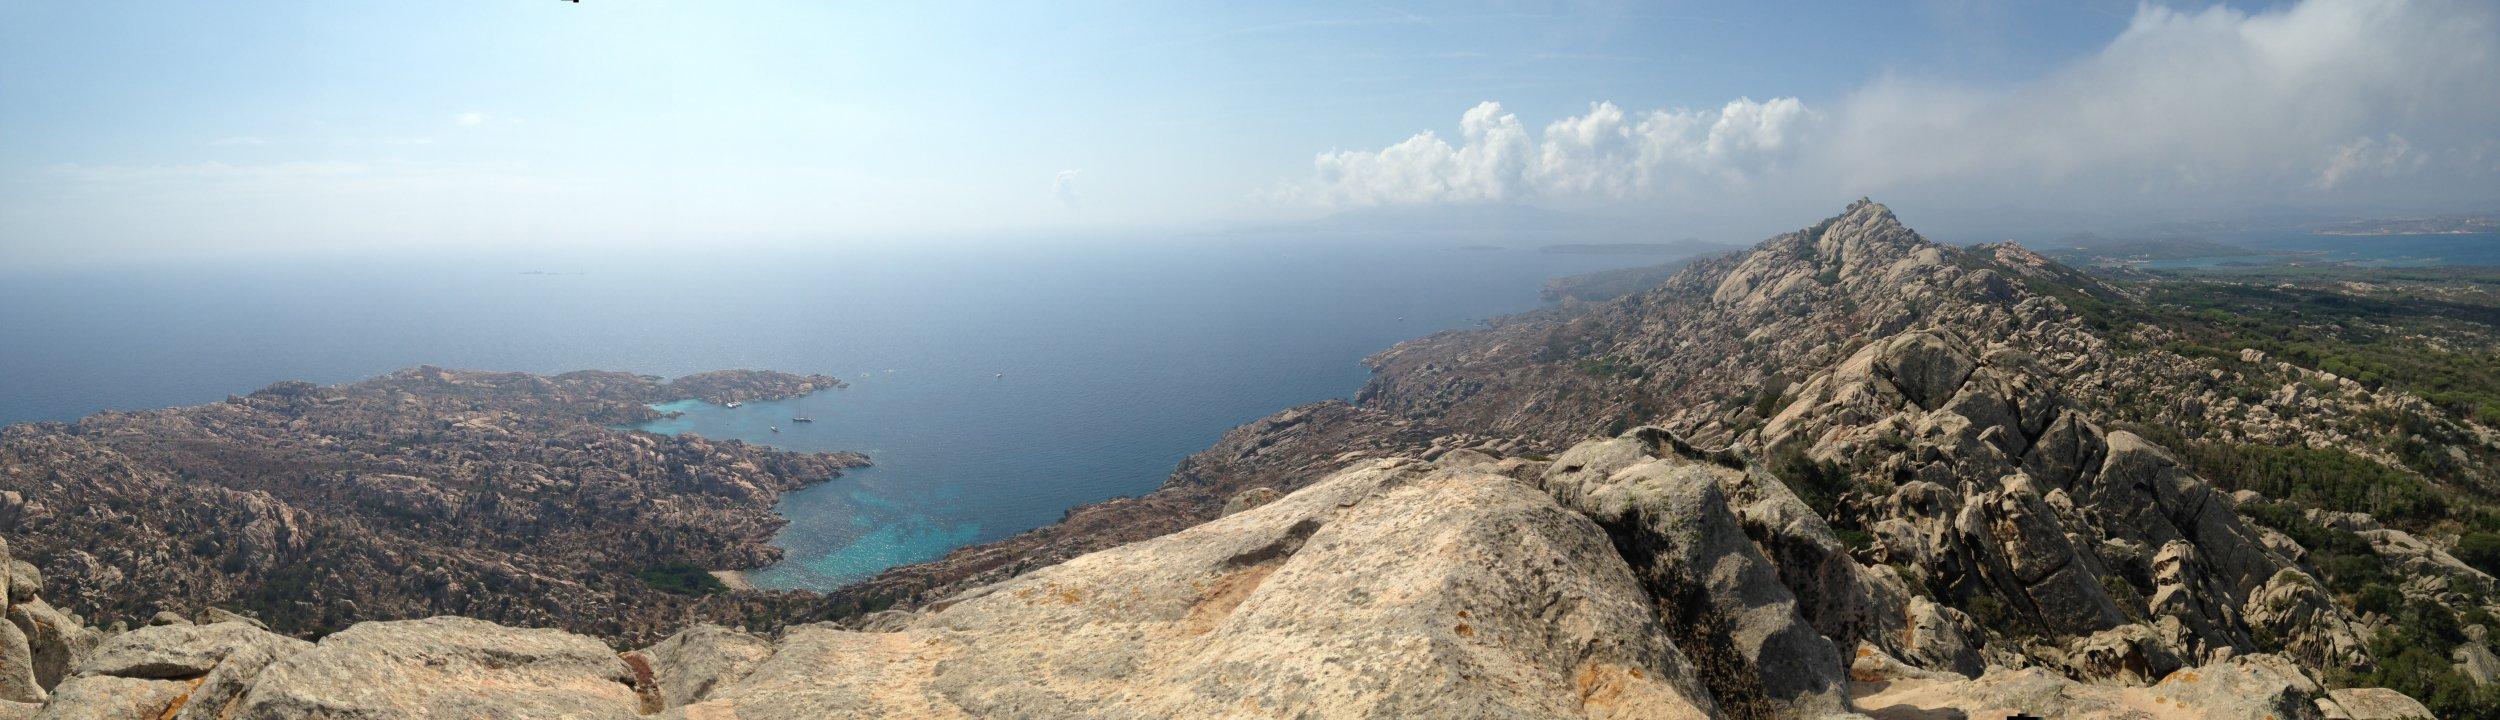 10_11_mediterranean_tsunami_coast